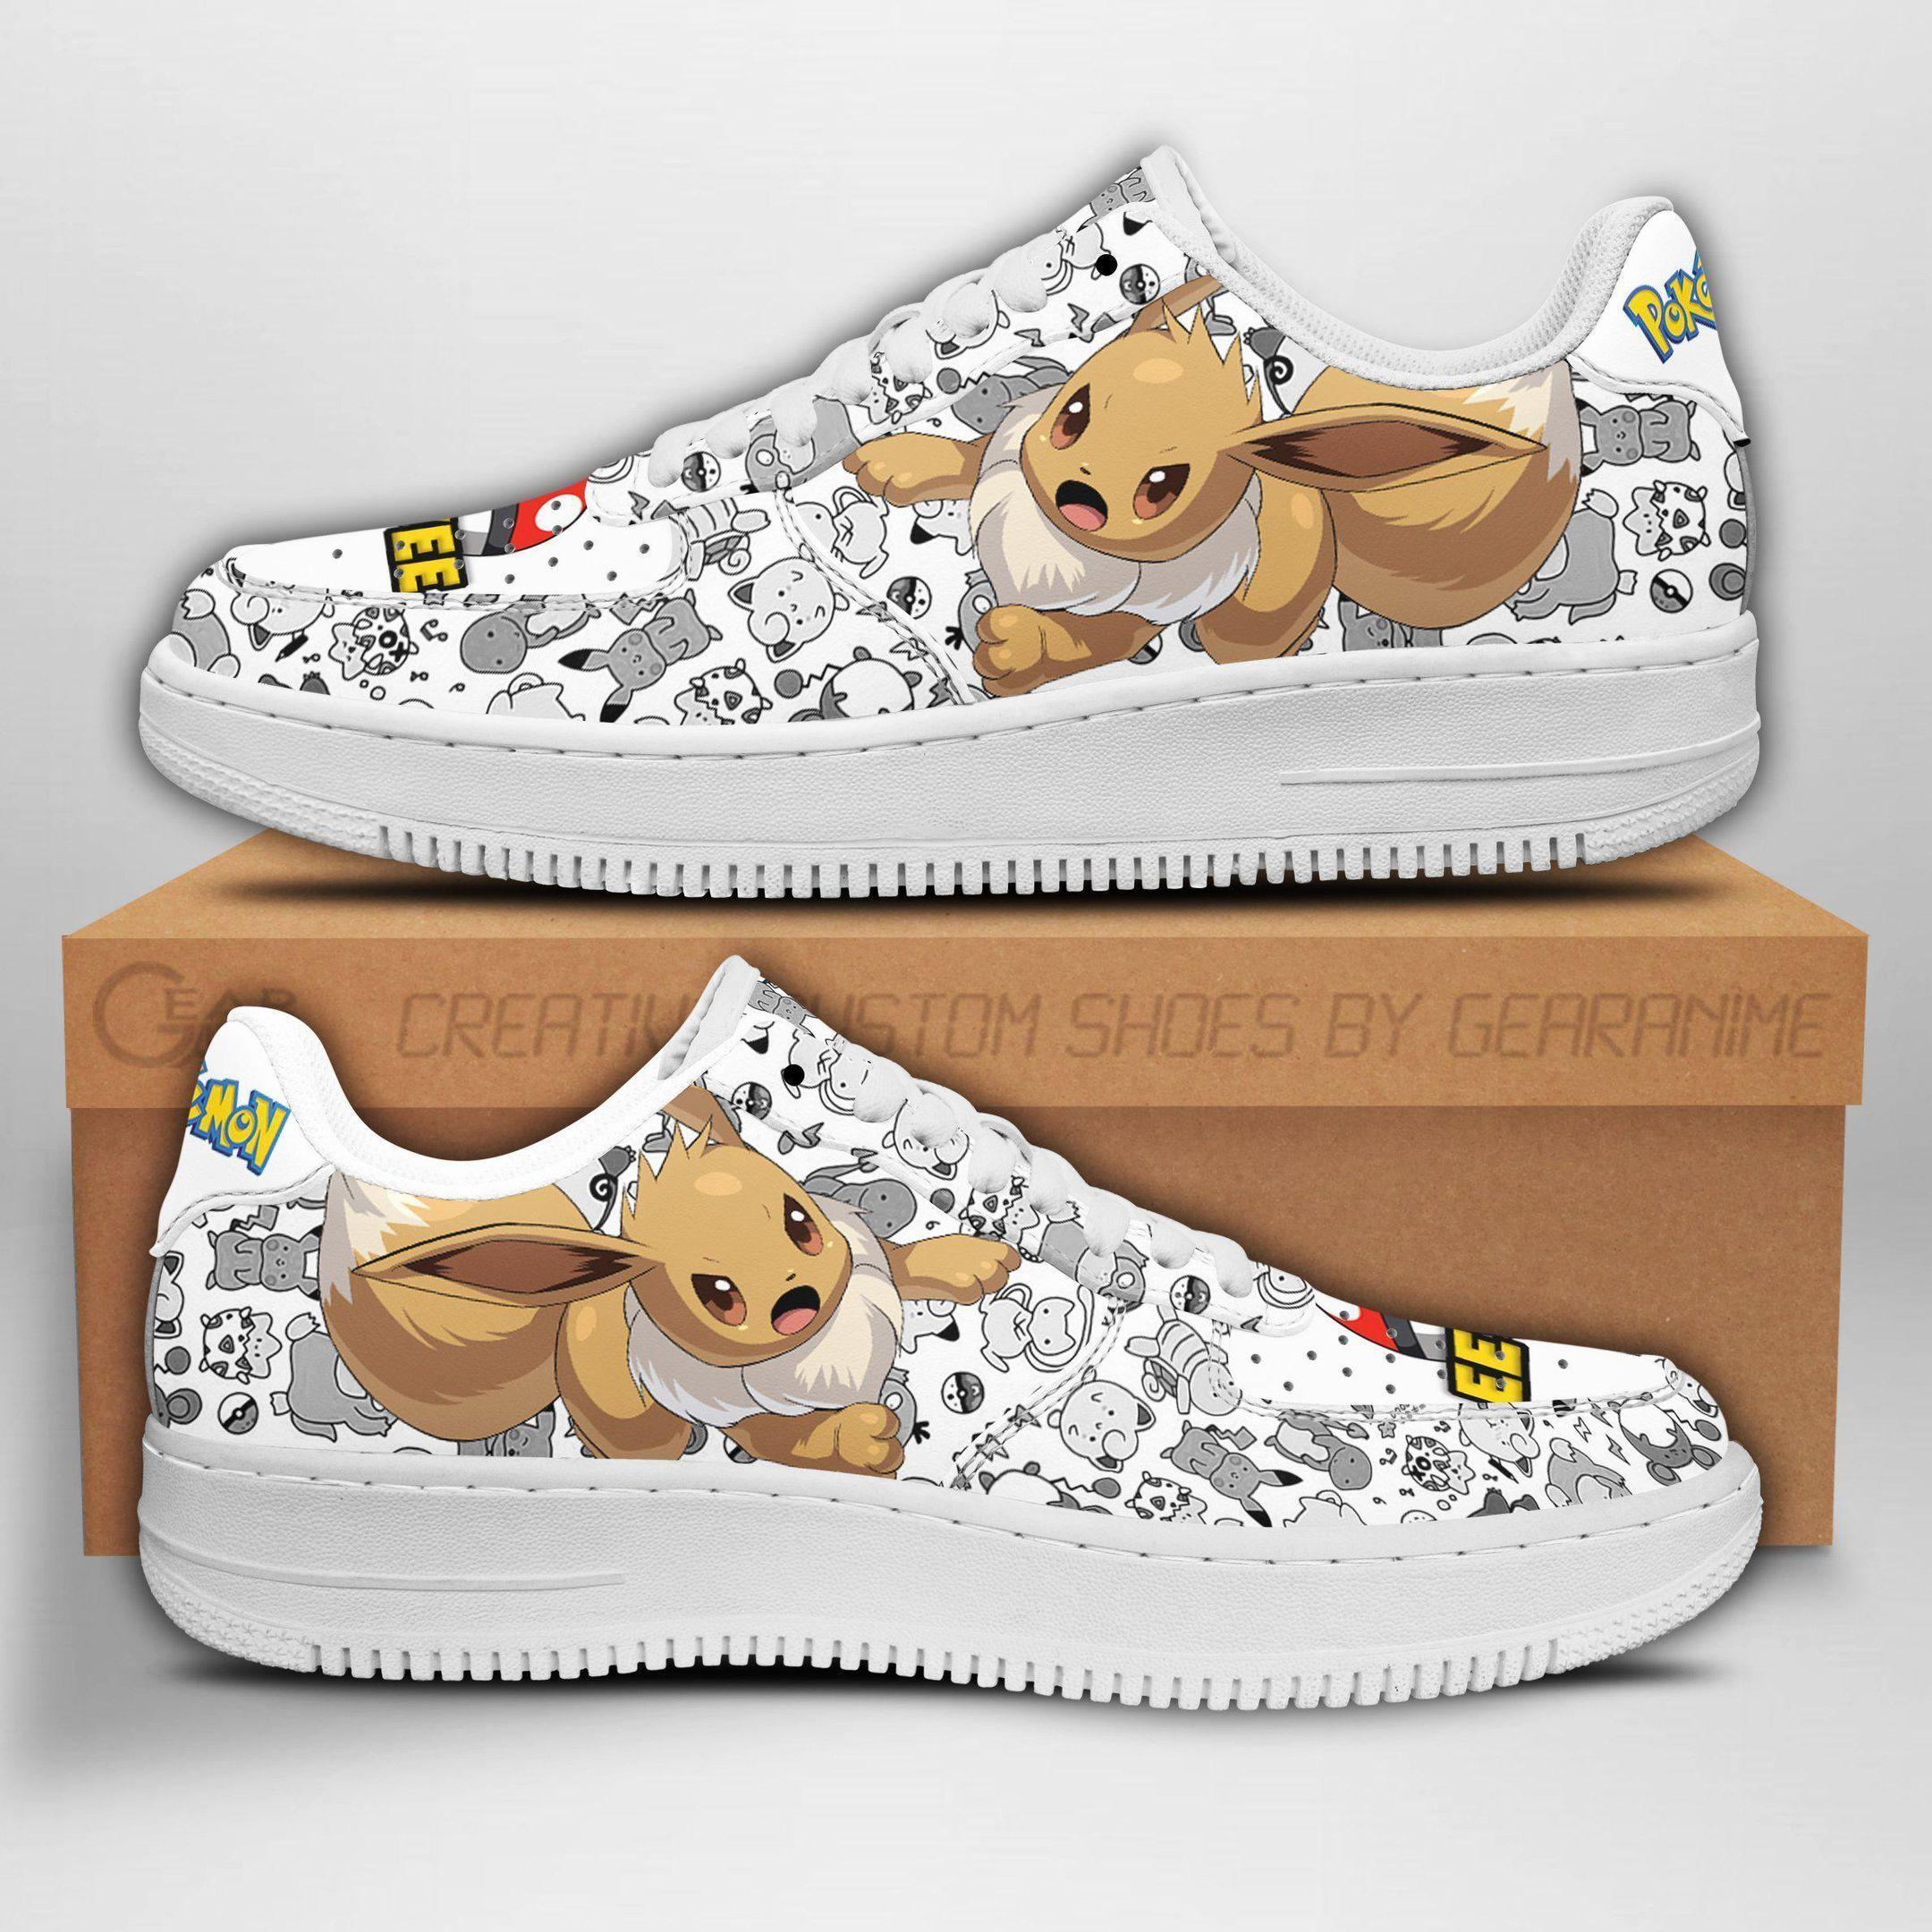 Eevee Air Shoes Pokemon Shoes Fan Gift Idea GO1012